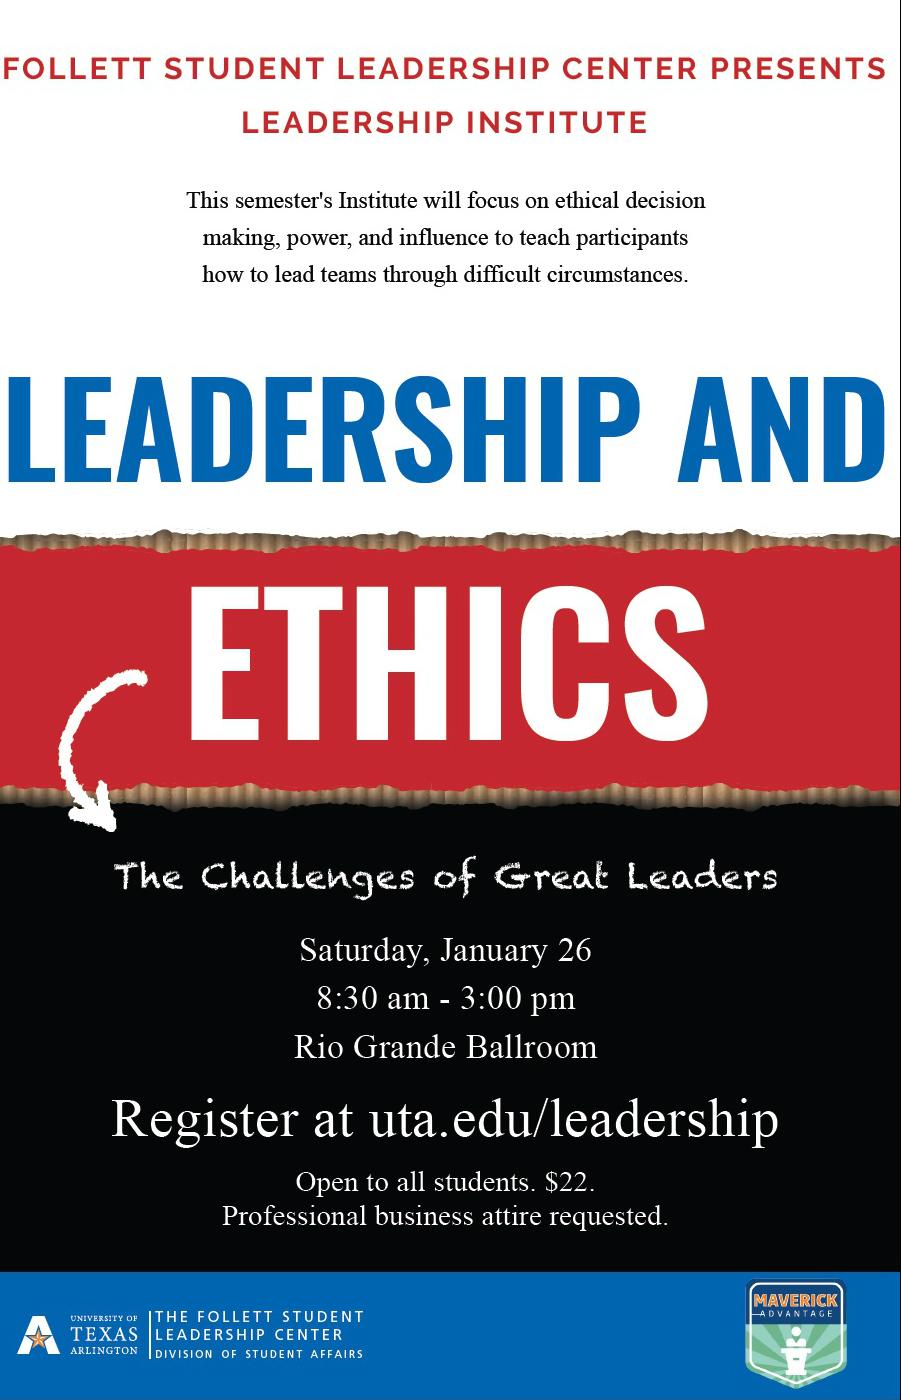 Ticket Info | UTATICKETS com - The University of Texas at